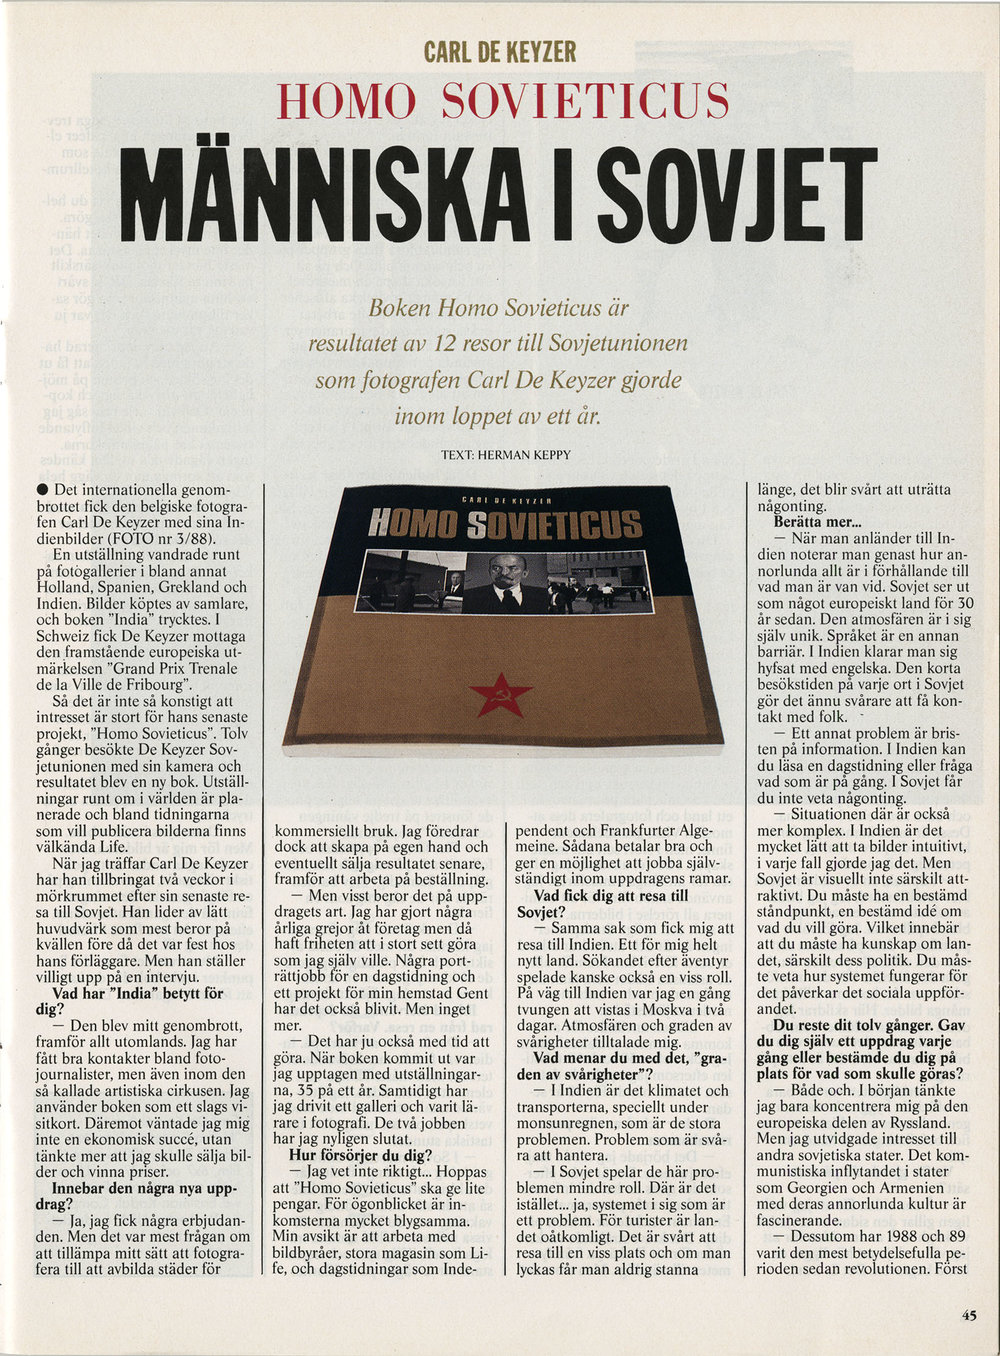 Foto & Video (Homo Sovieticus)